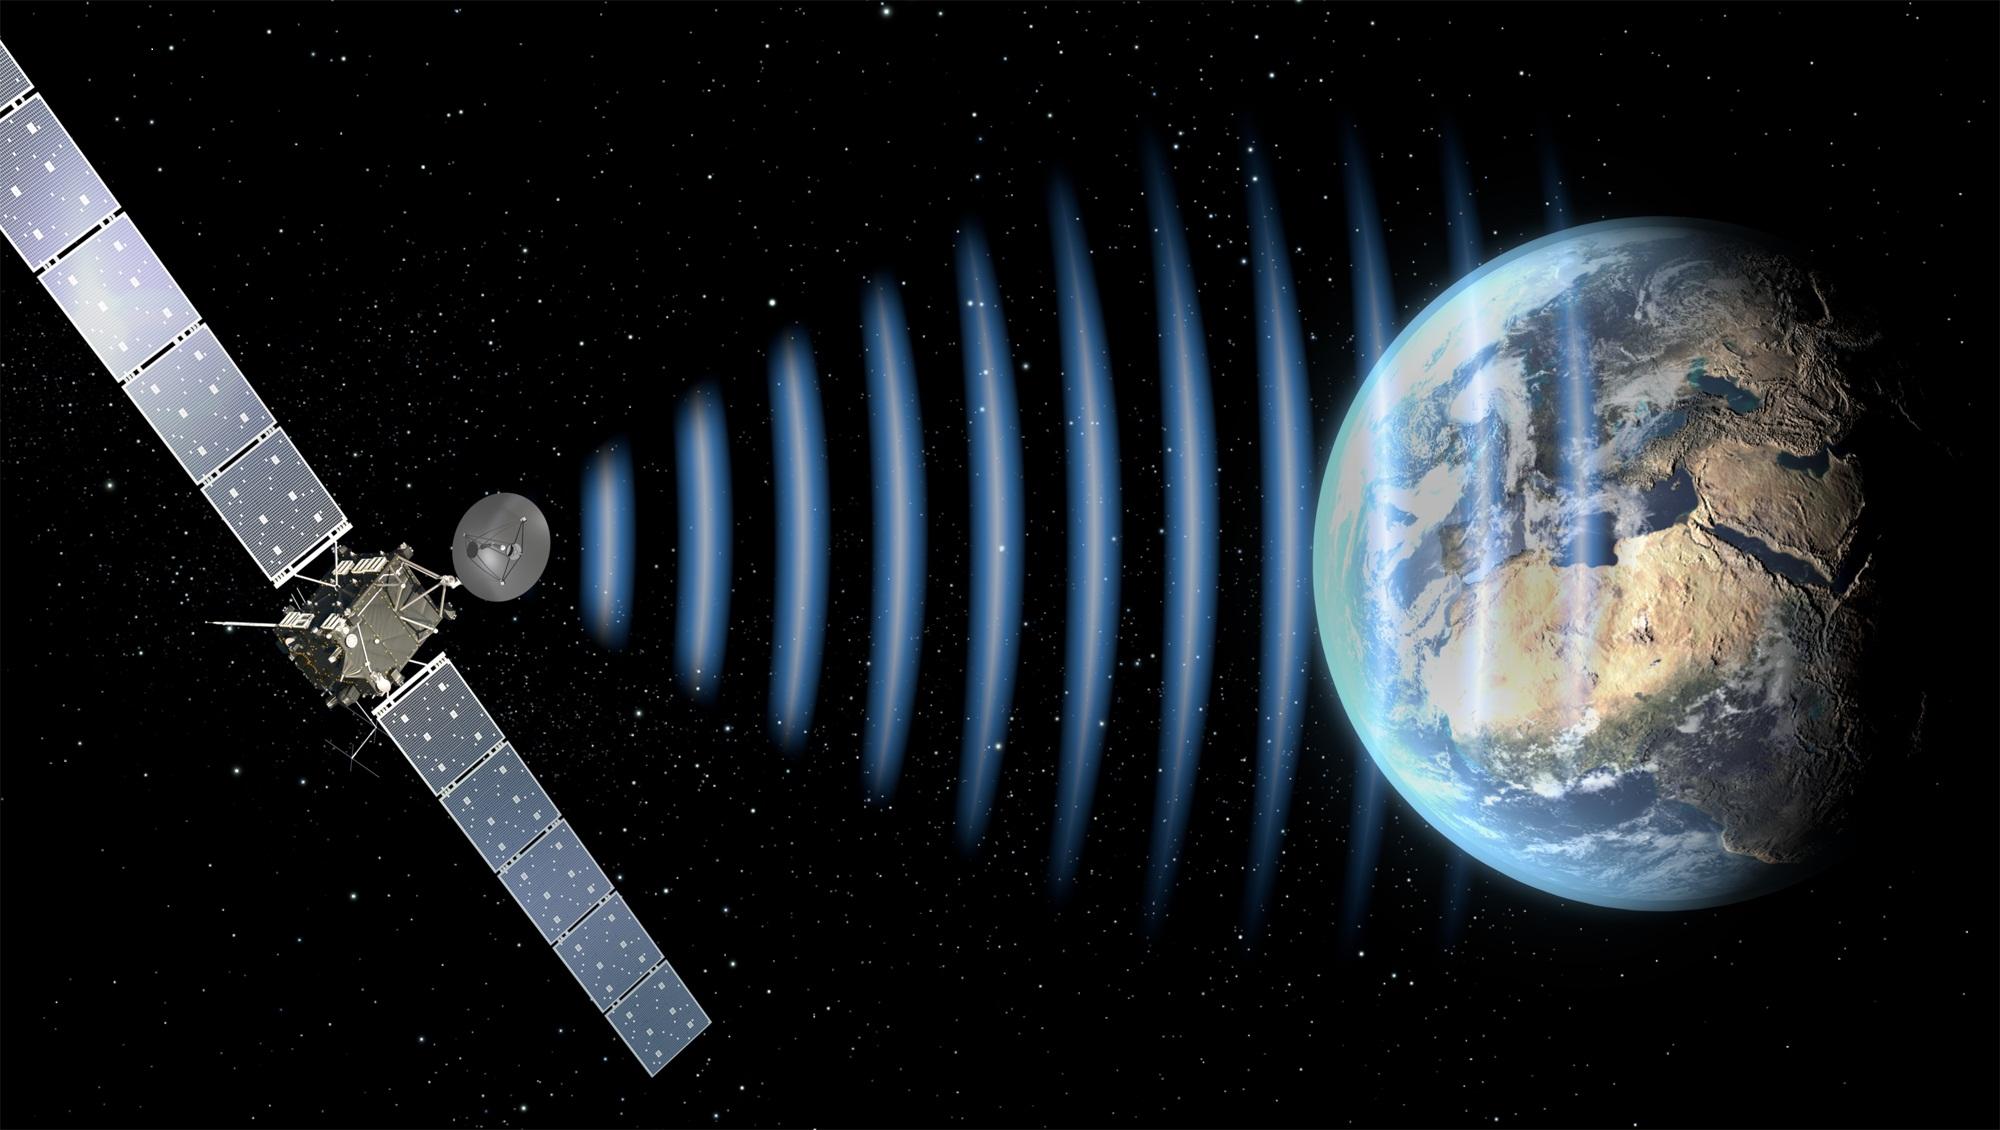 Space in Images - 2013 - 01 - Rosetta calls home